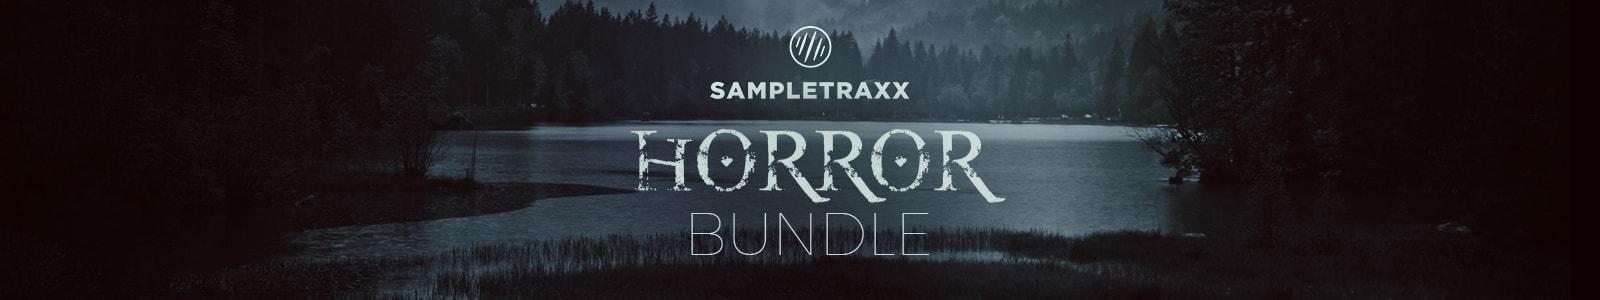 SAMPLETRAXX HORROR BUNDLE